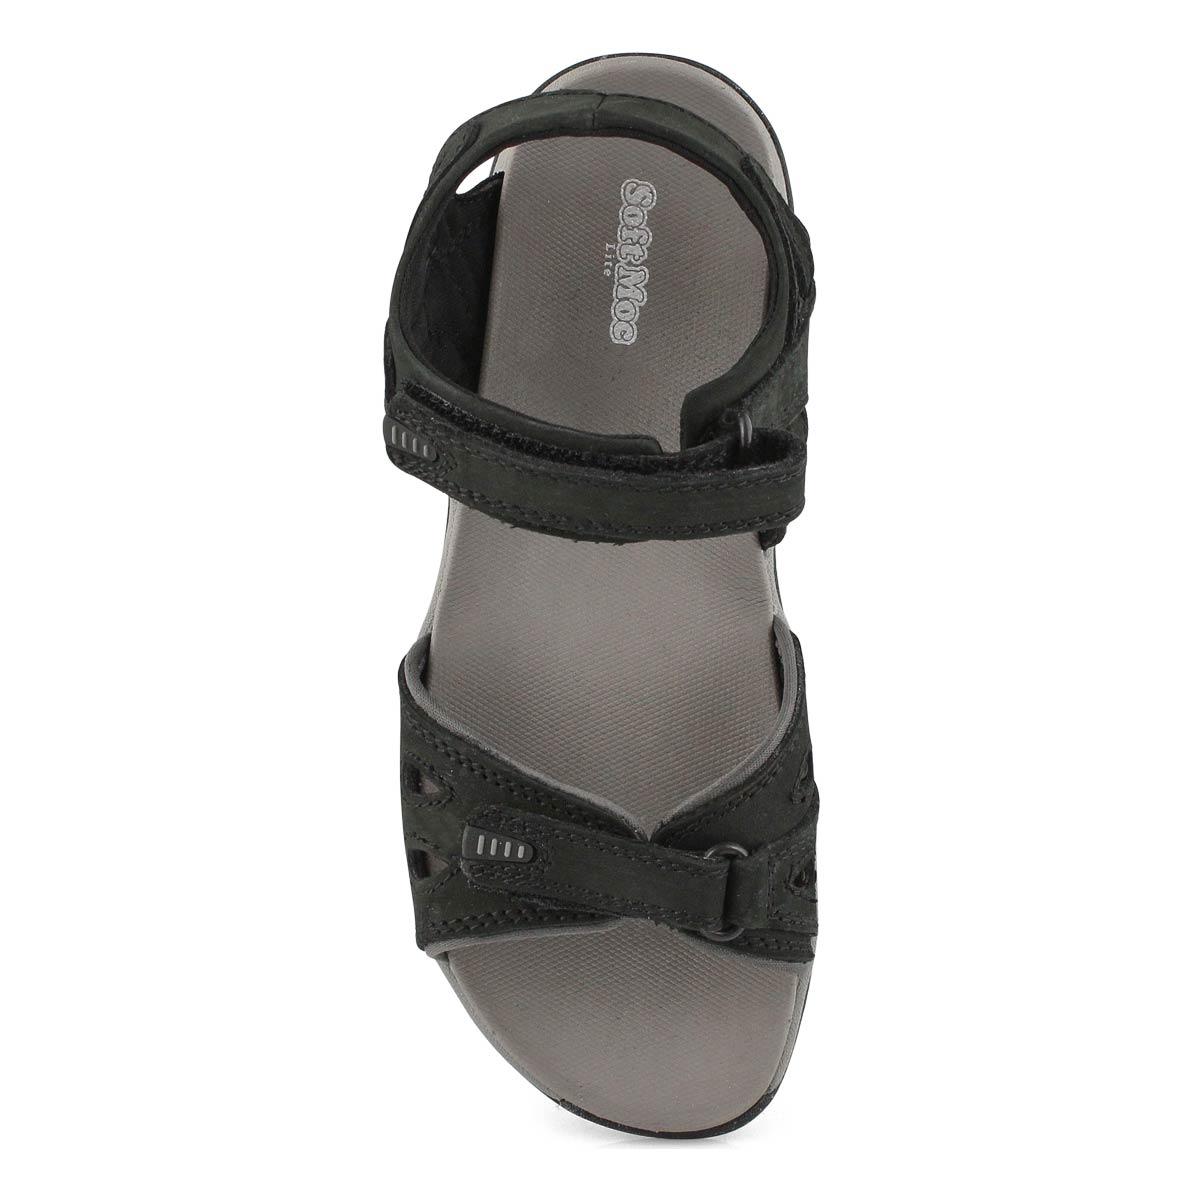 Lds Caley 3 black sport sandal